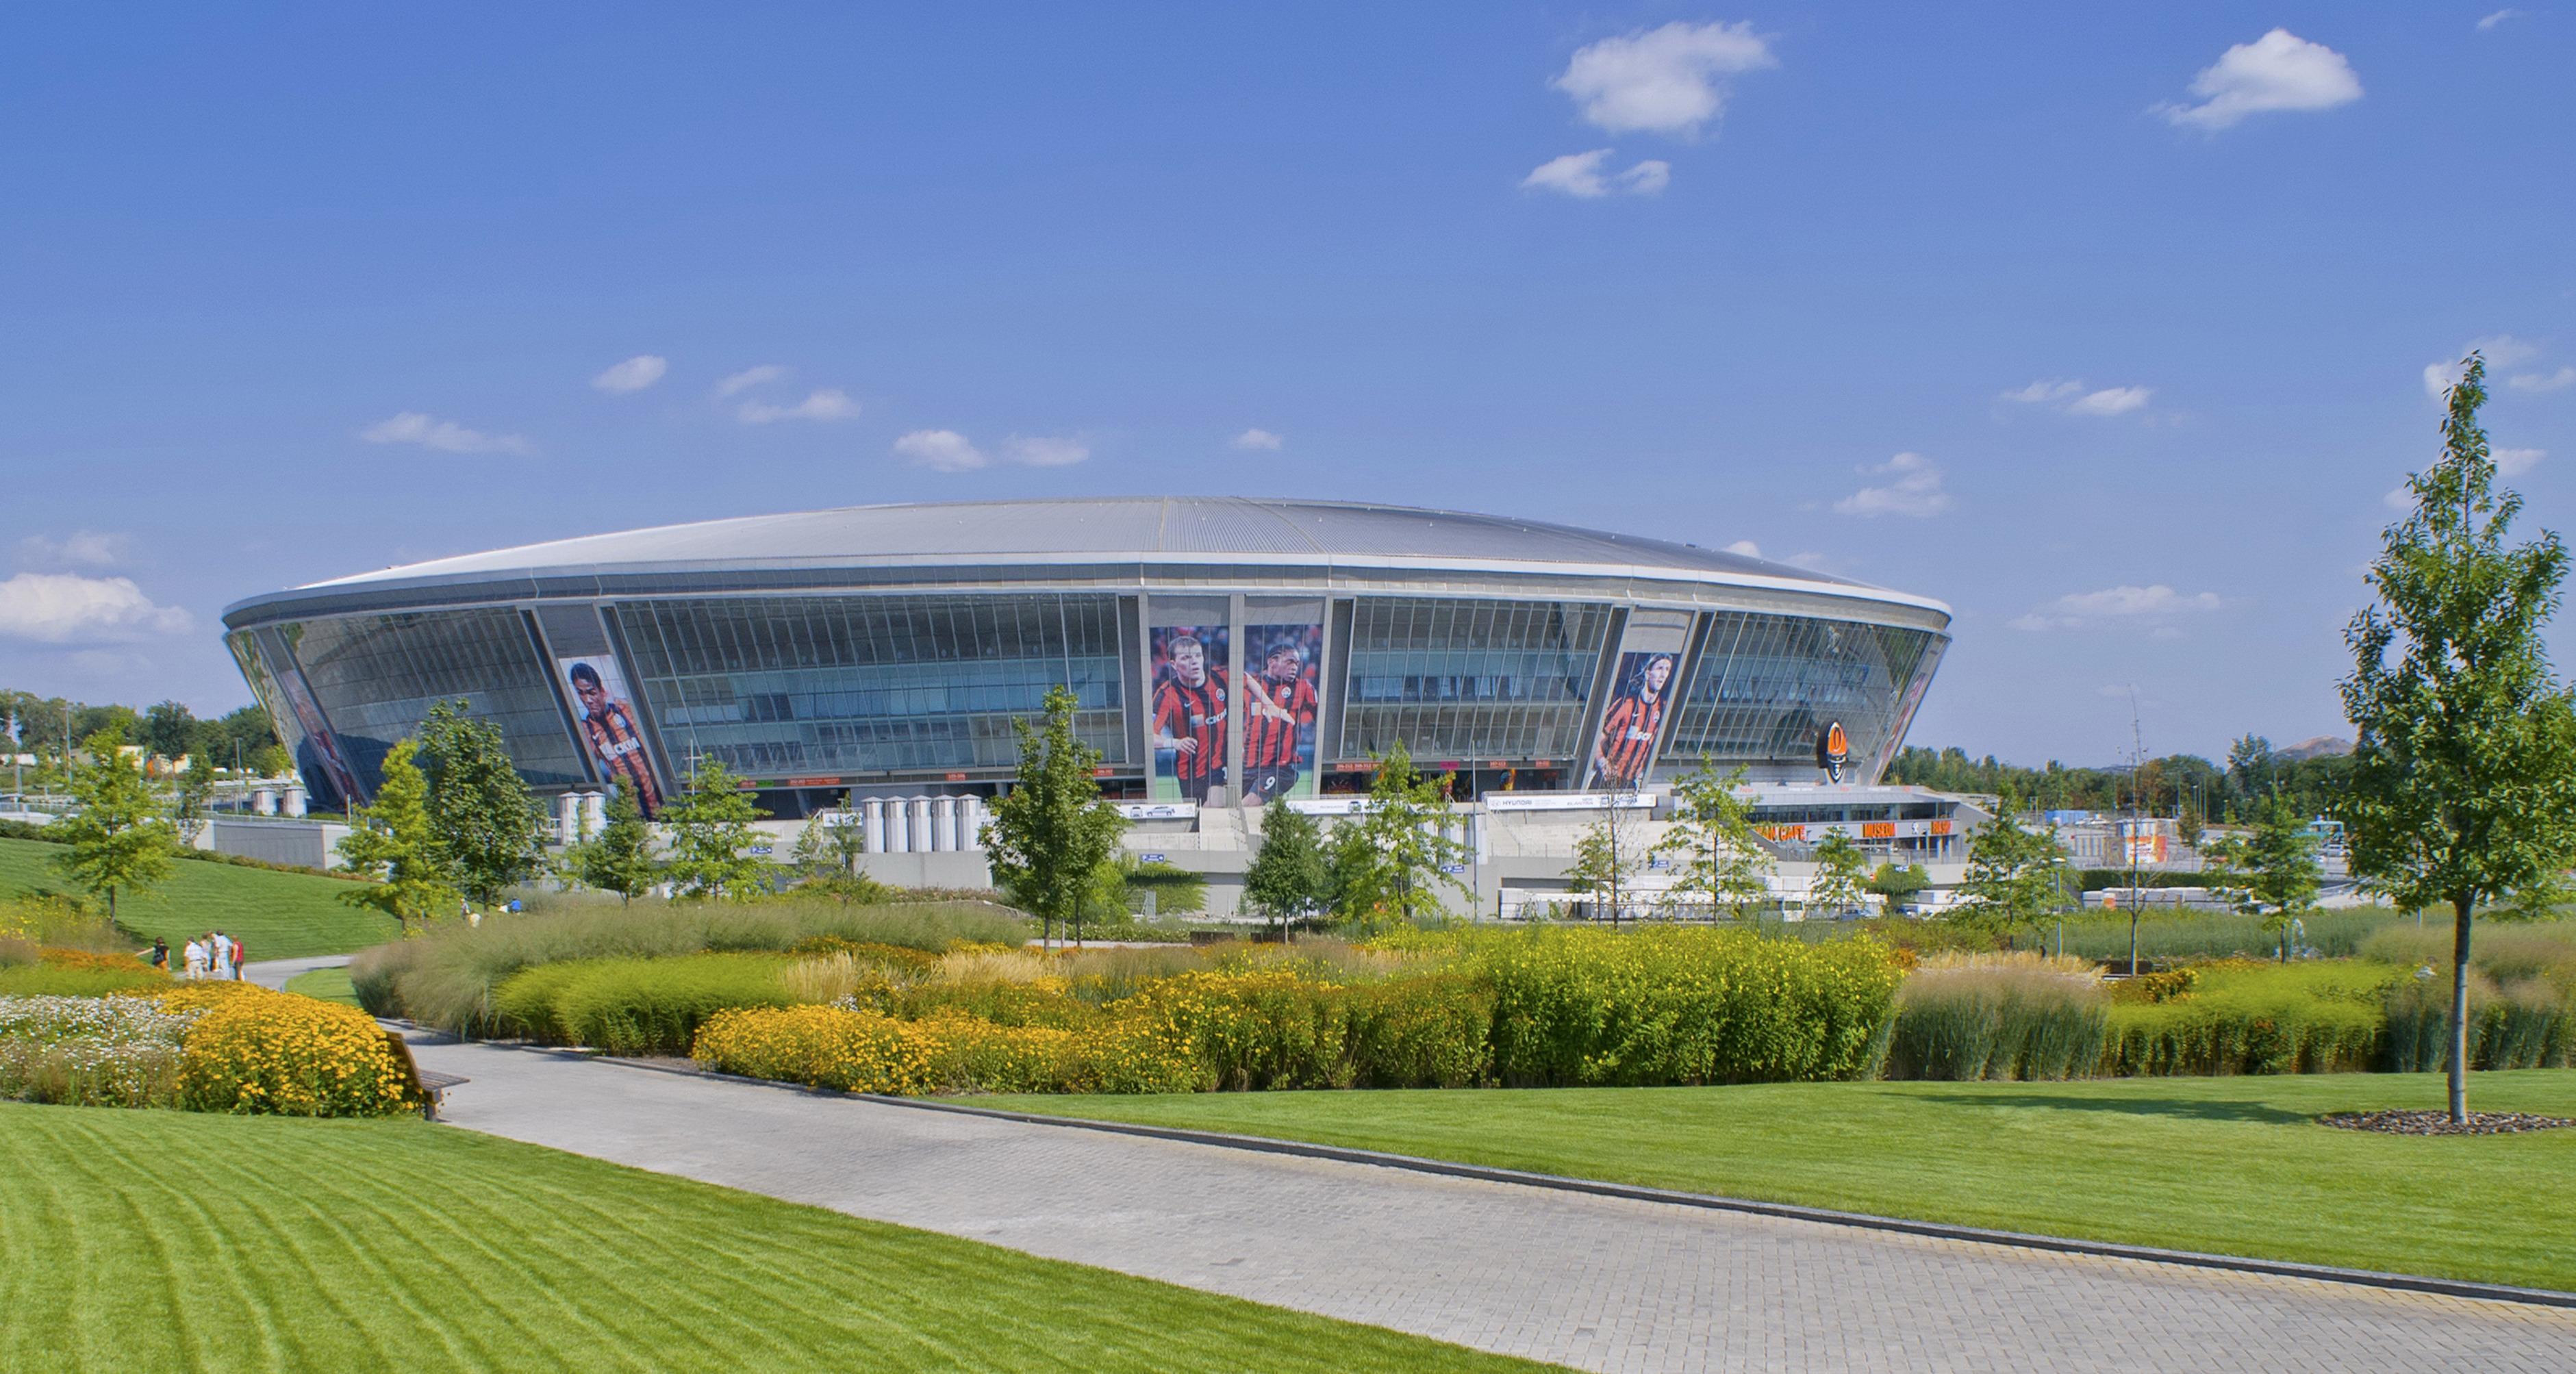 Ukraine, Donbass, Donezk, Fussballstadion Donbass Arena